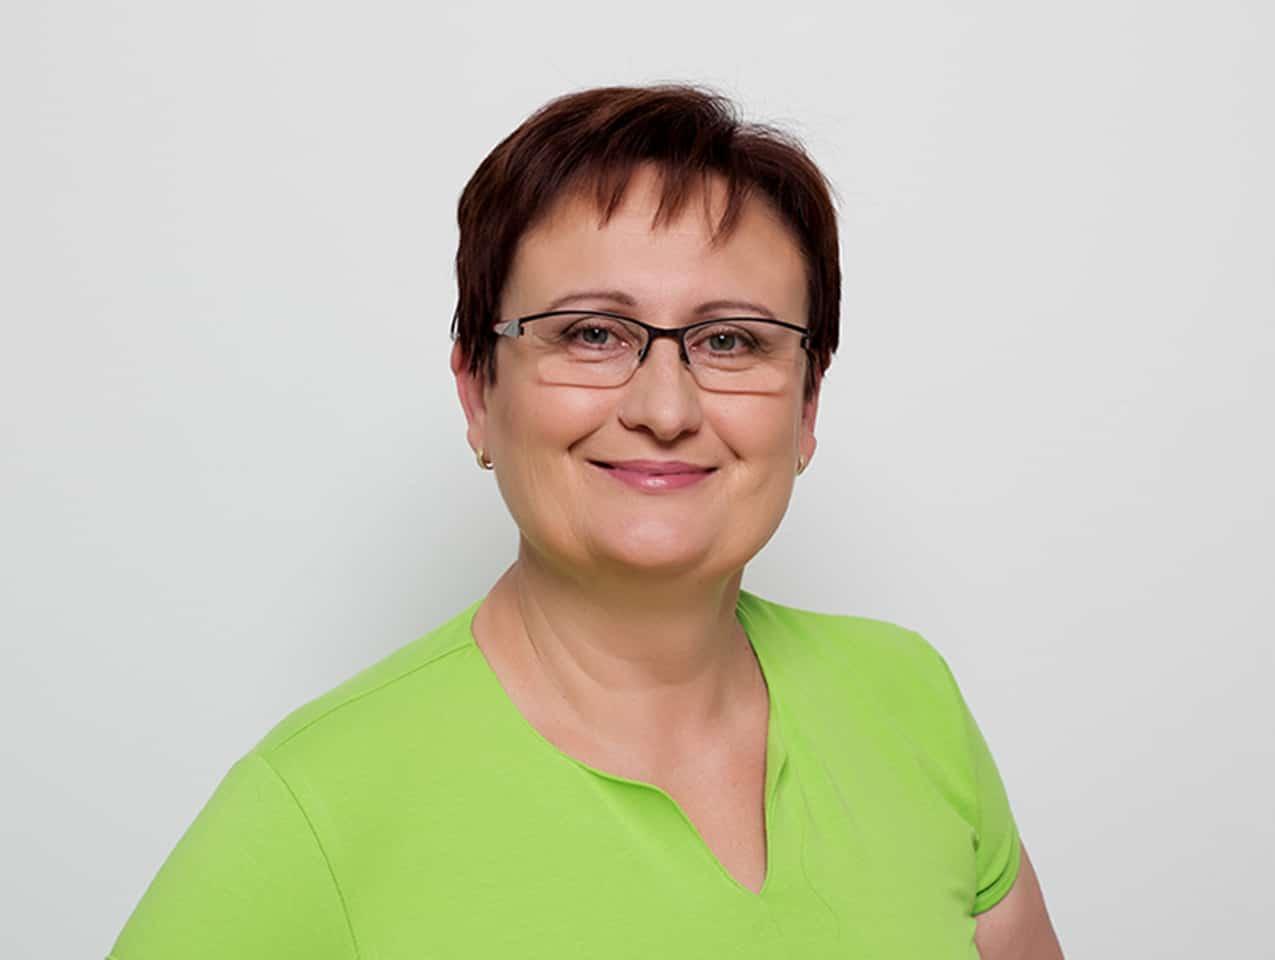 Jarmila Slamova